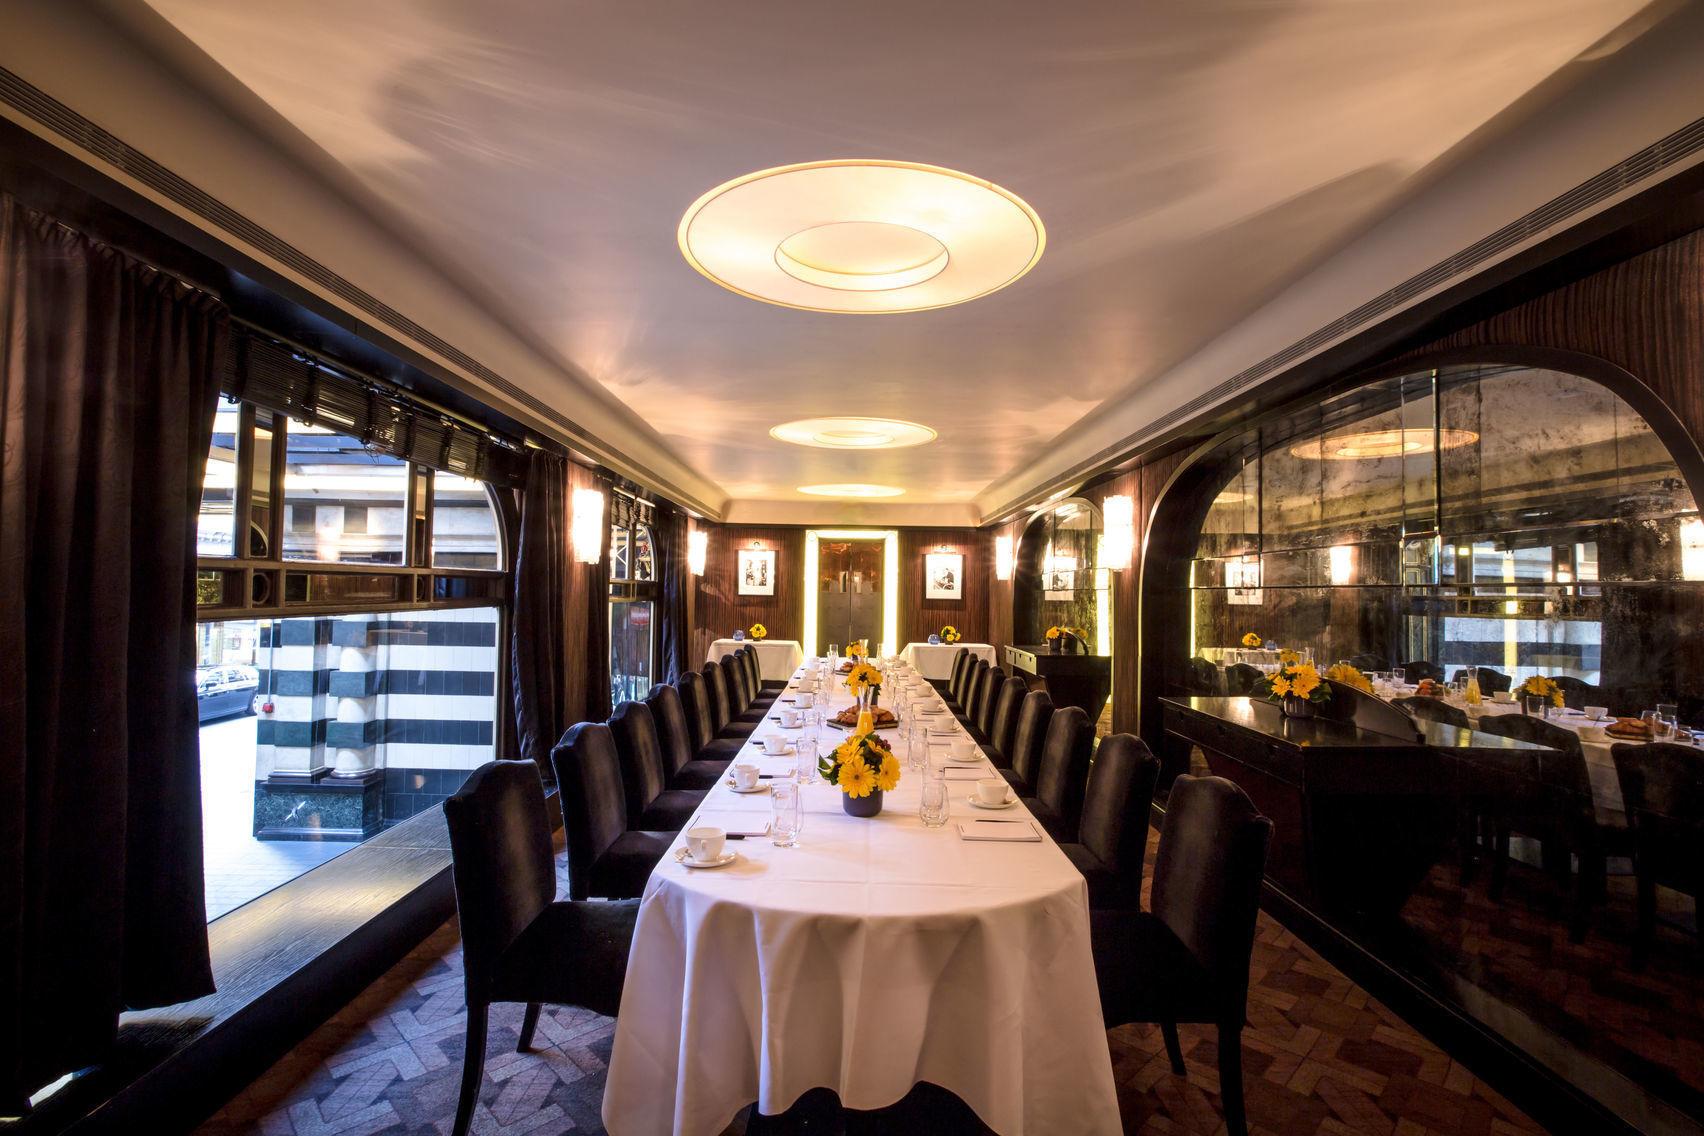 D'oyle Carte Room, Savoy Grill